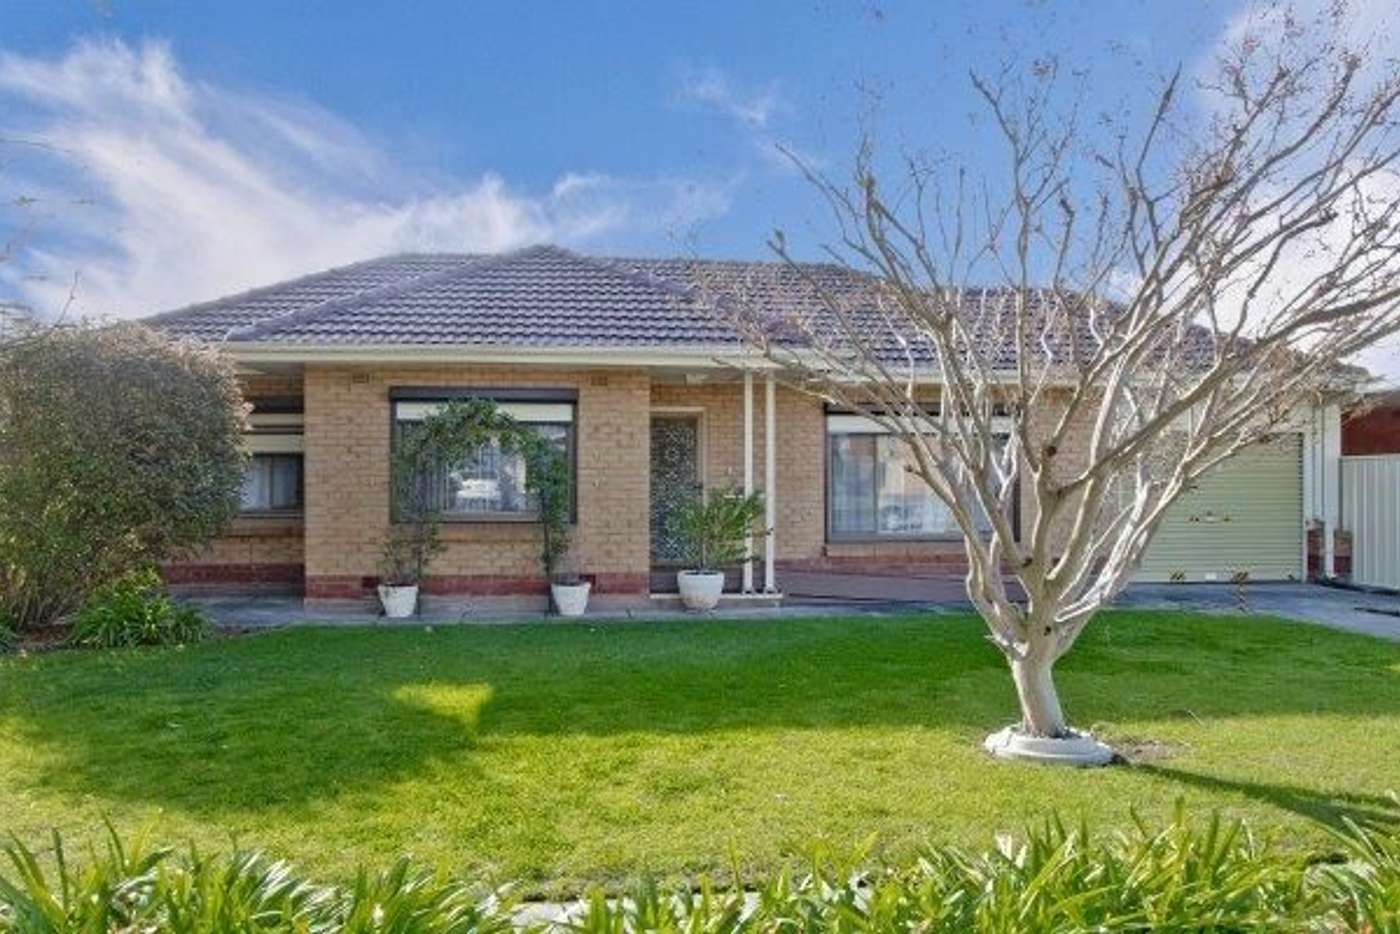 Main view of Homely house listing, 36 Valetta Road, Kidman Park SA 5025